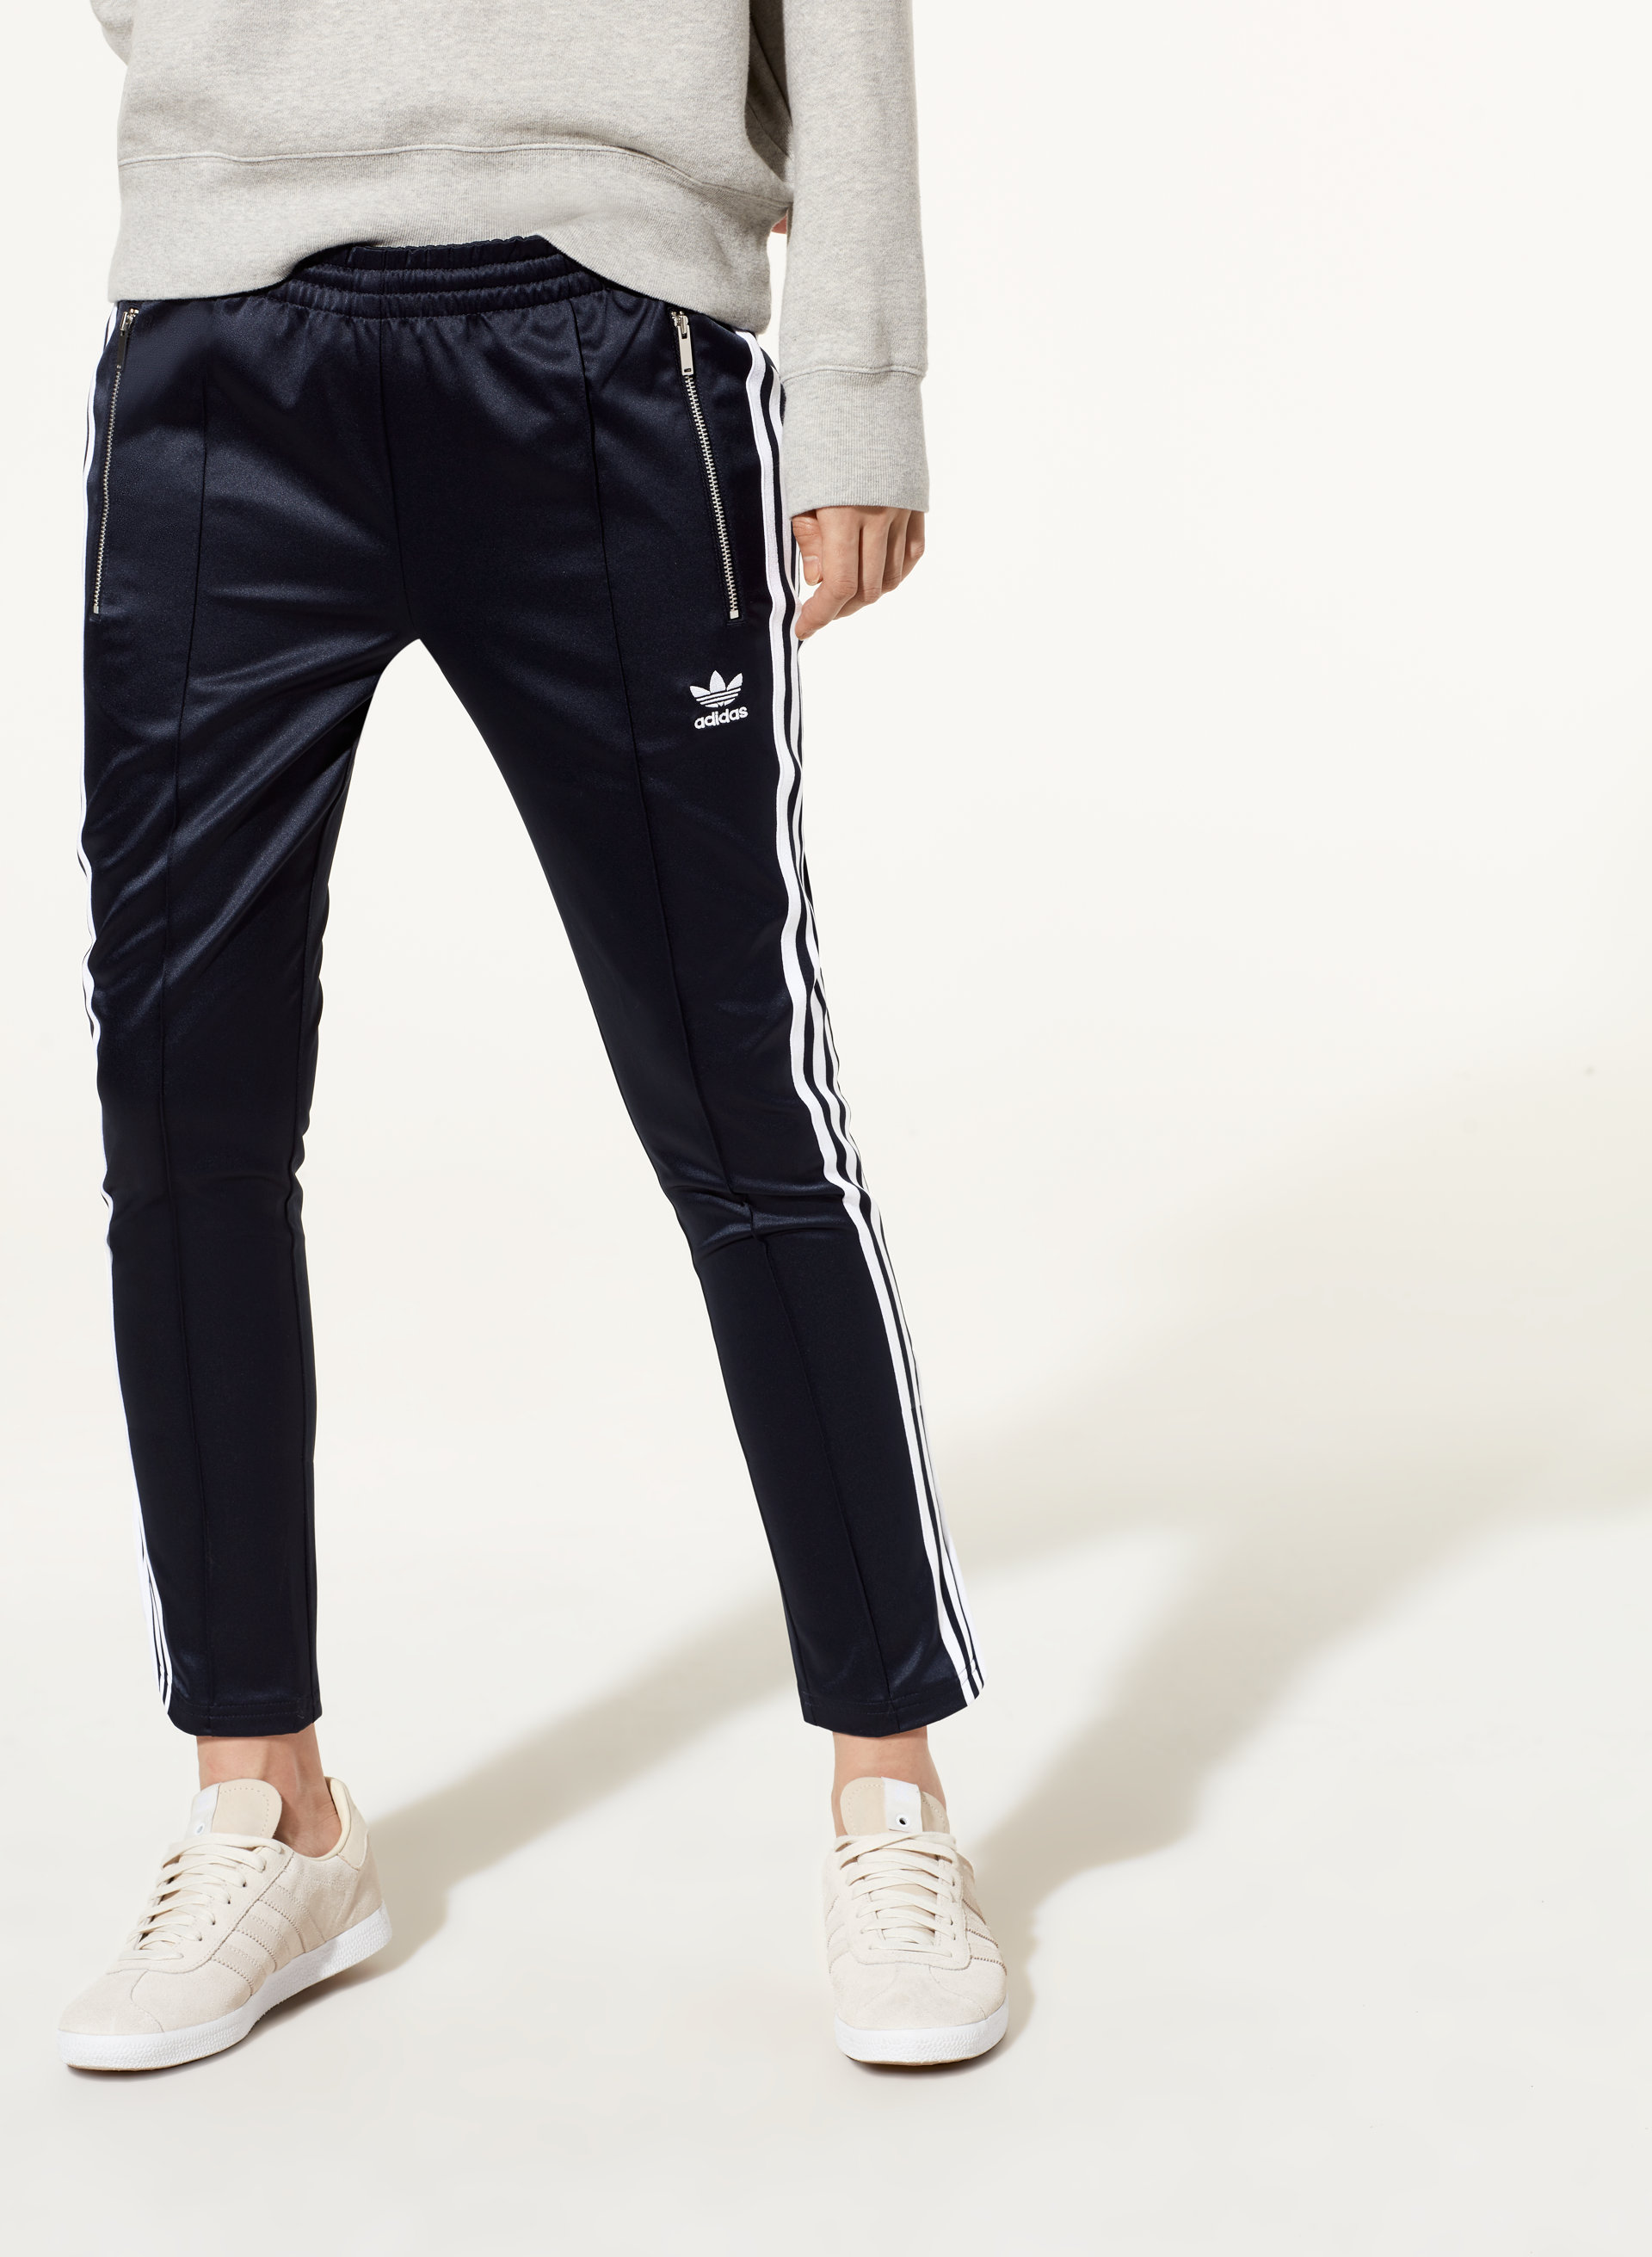 pantalon adidas coupe cogarette